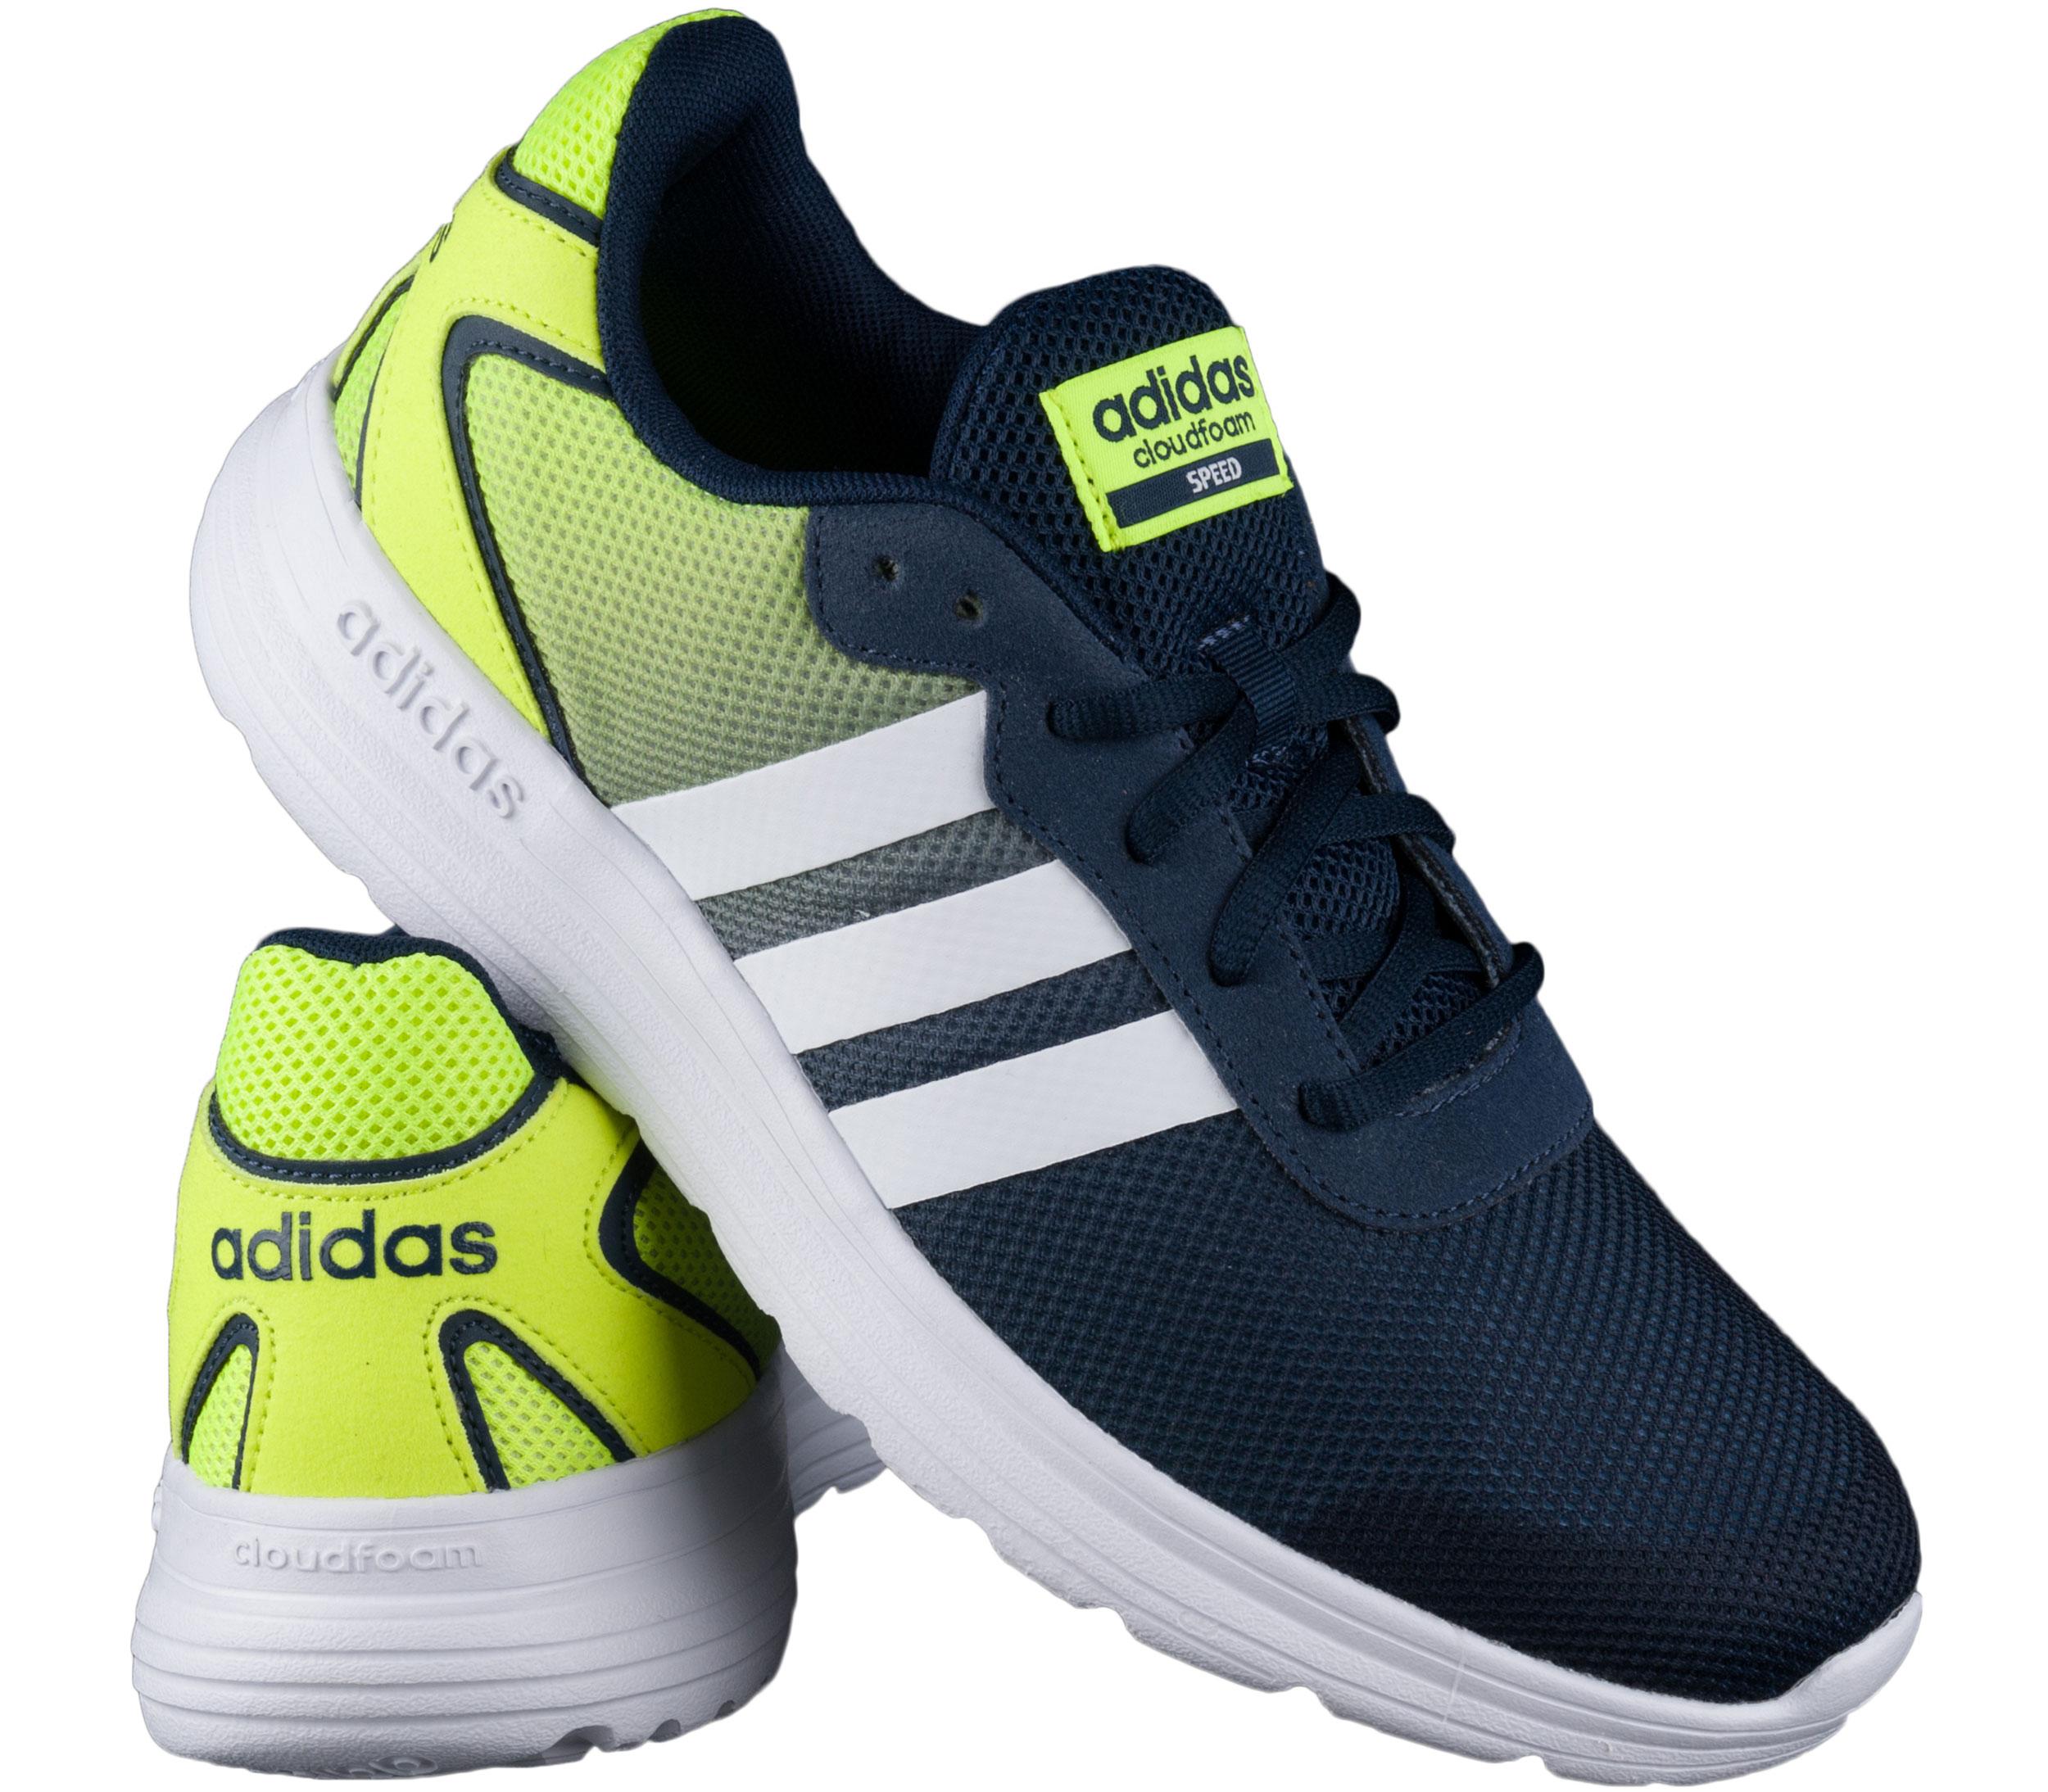 Adidas Neo Buty Cloudfoam Speed AQ1432 40 23